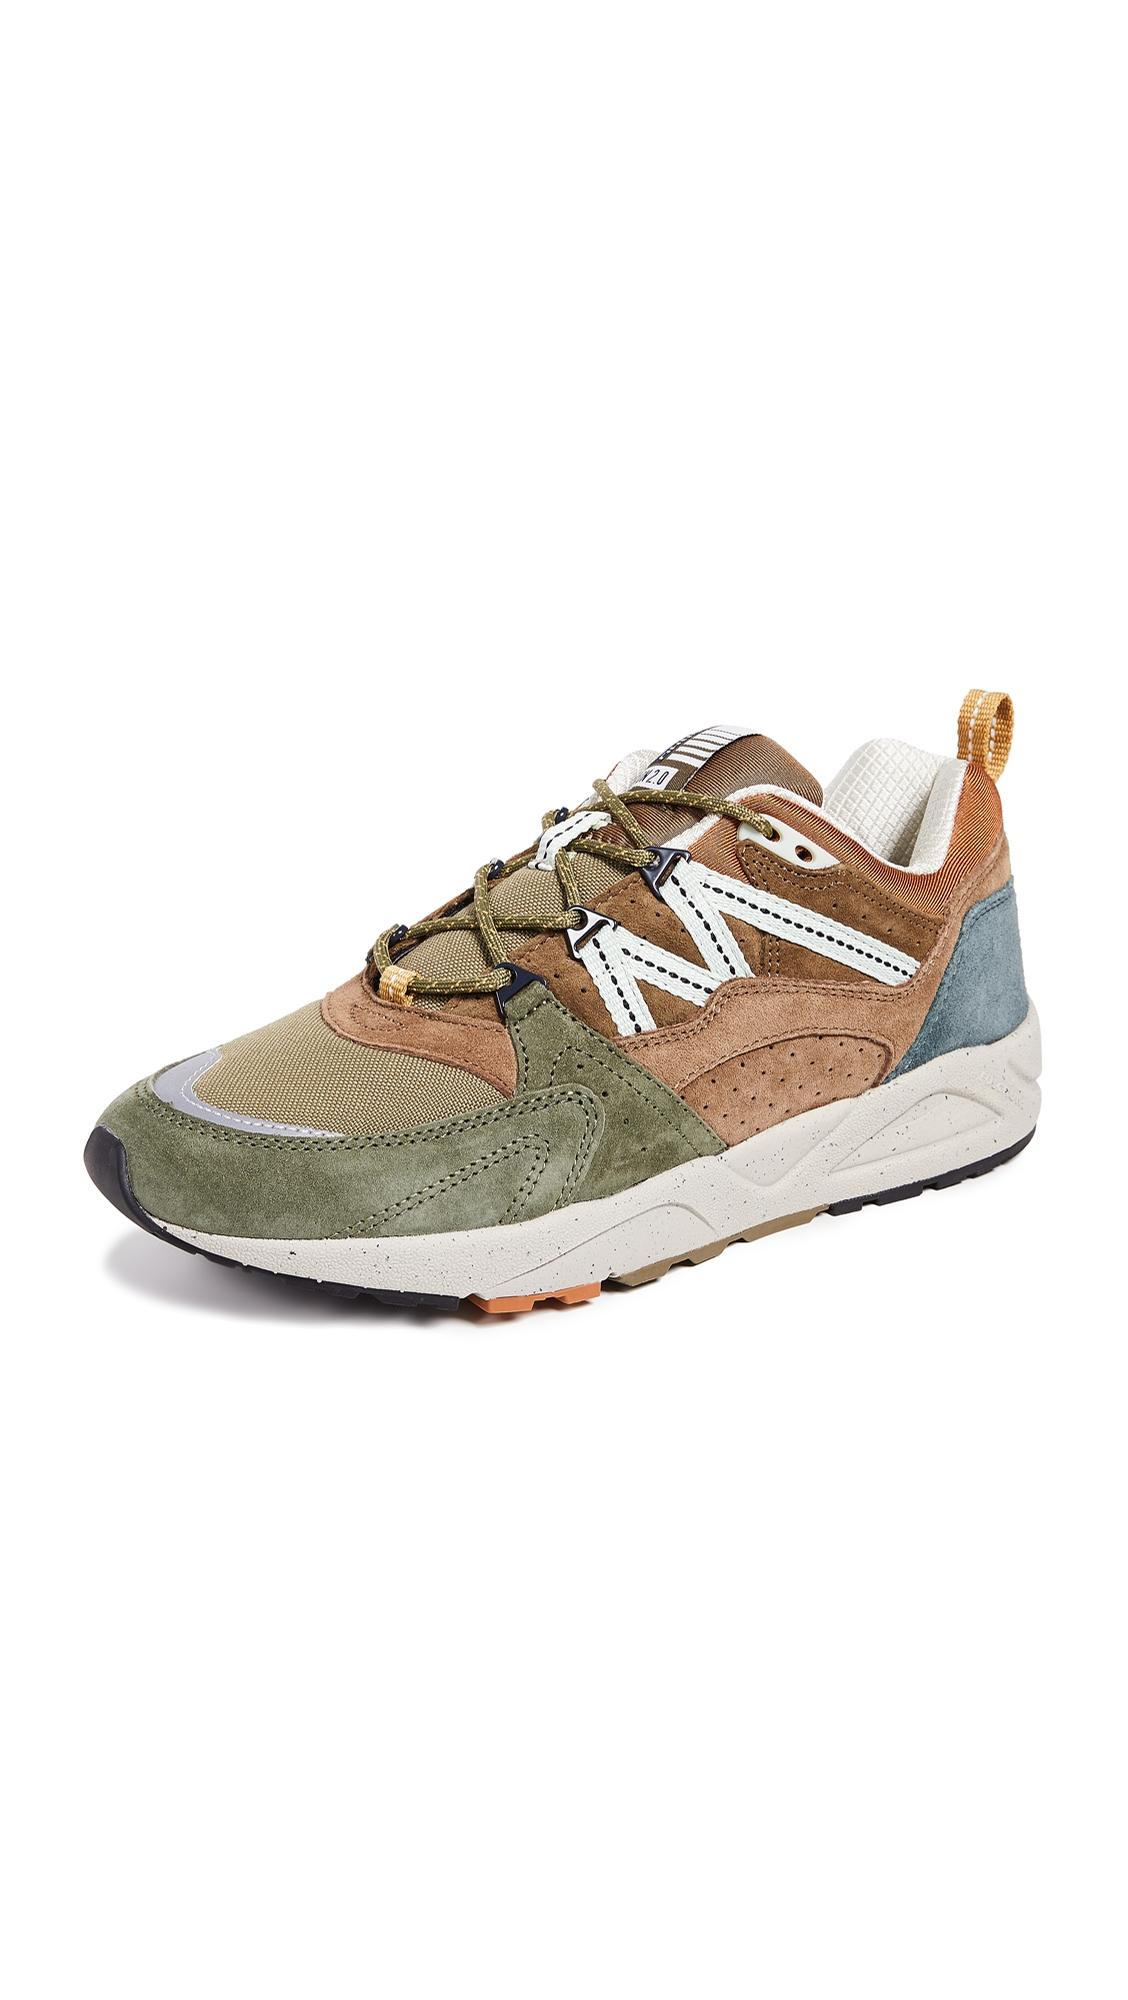 KARHU Fusion 2.0 Sneakers in Butternut/Capulet Olive